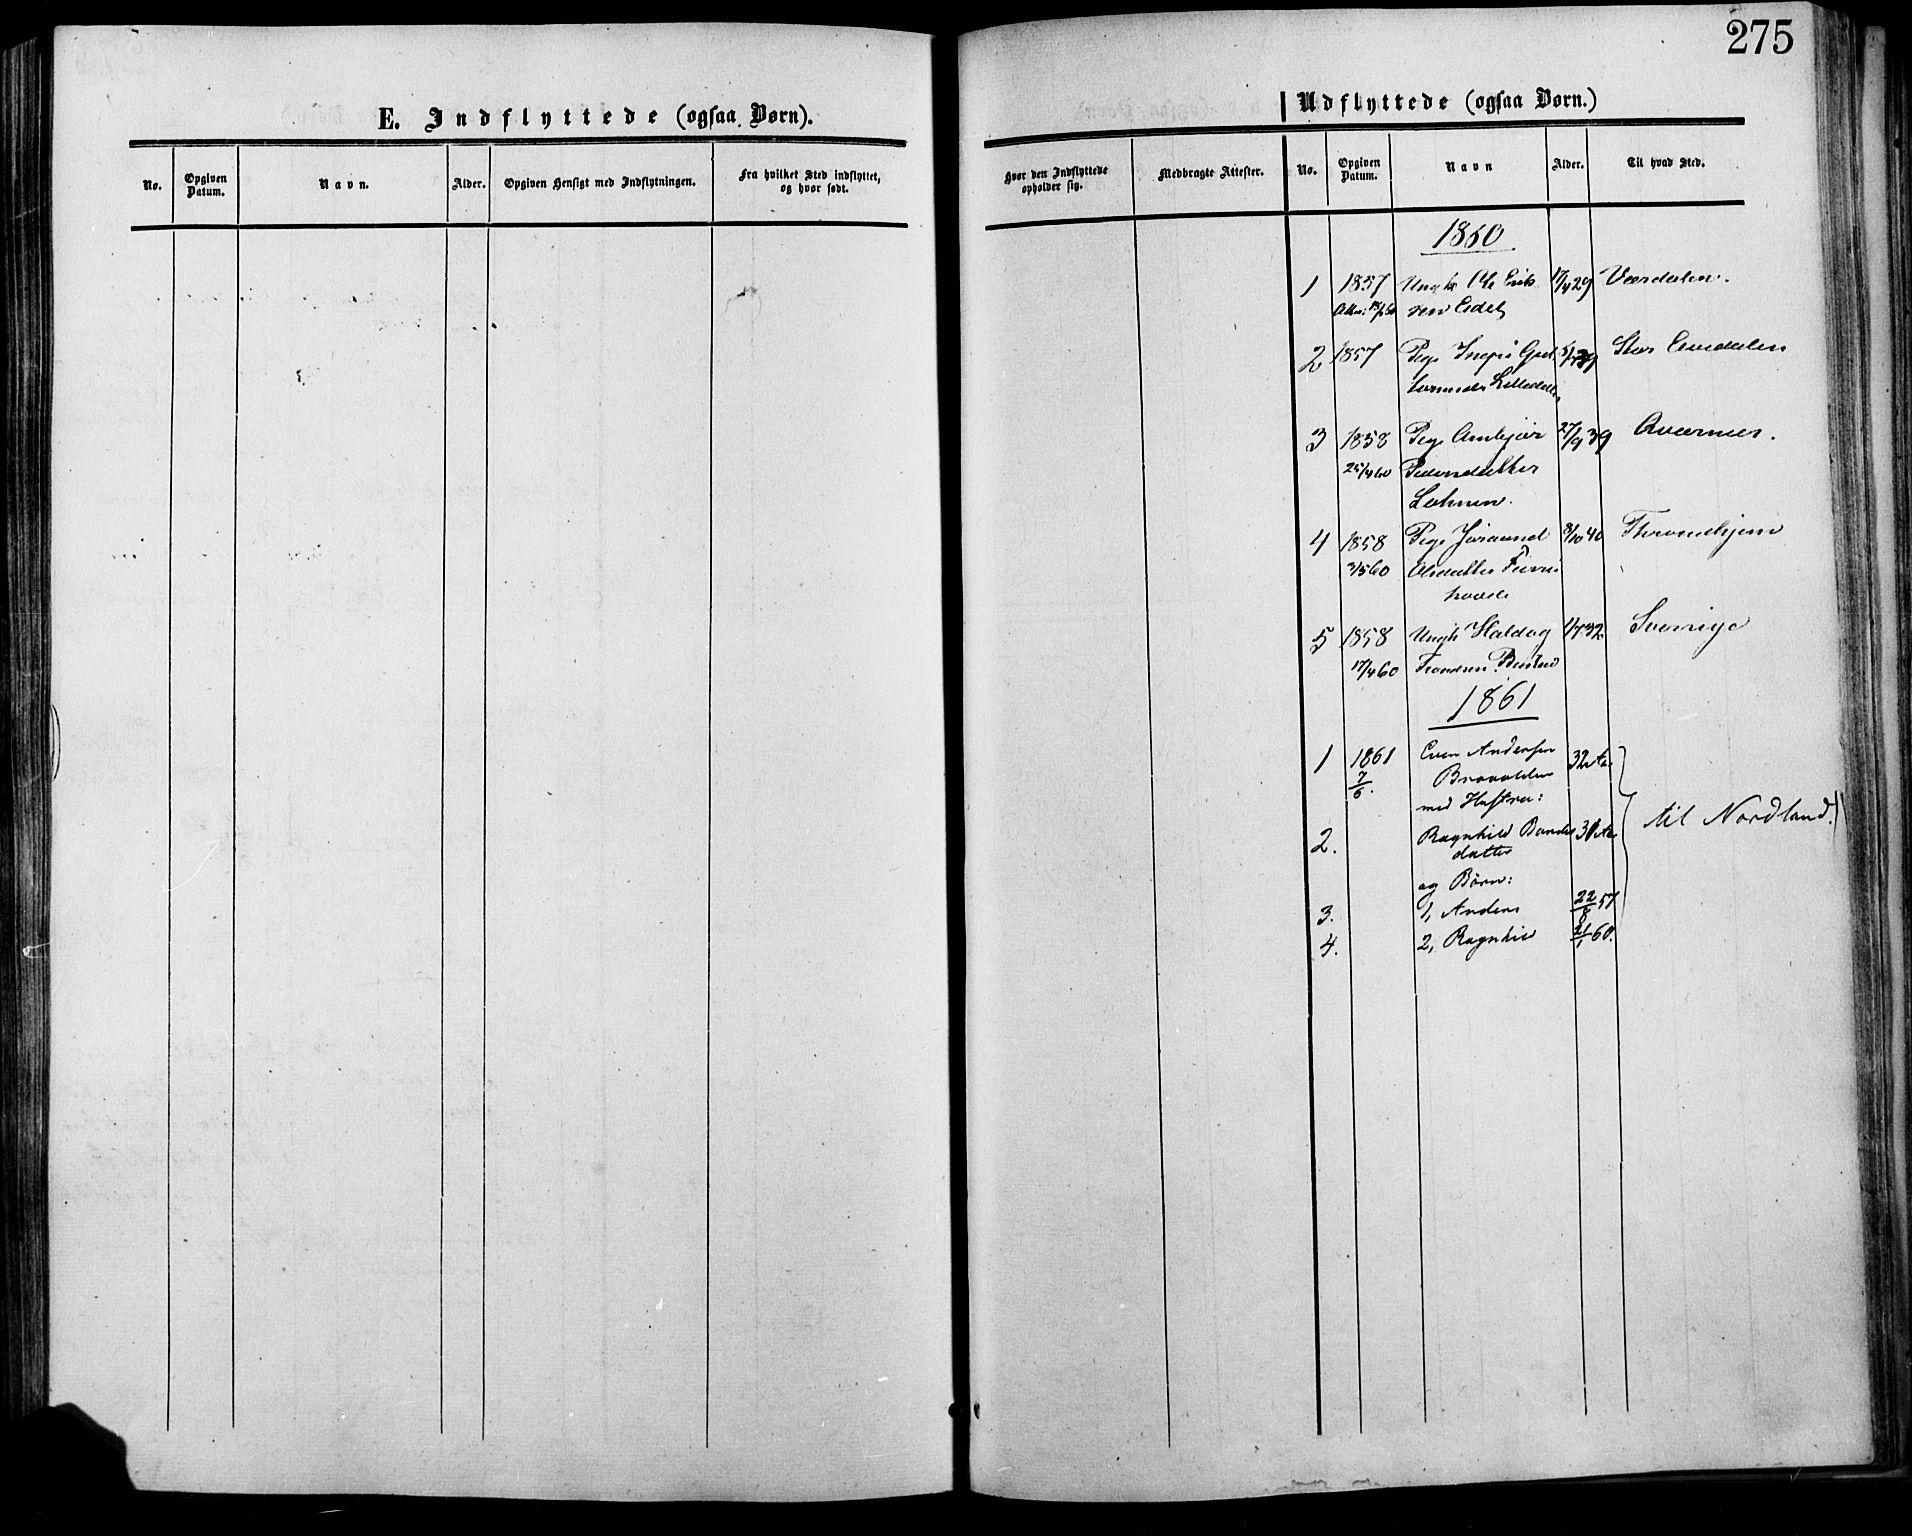 SAH, Lesja prestekontor, Ministerialbok nr. 7, 1854-1862, s. 275